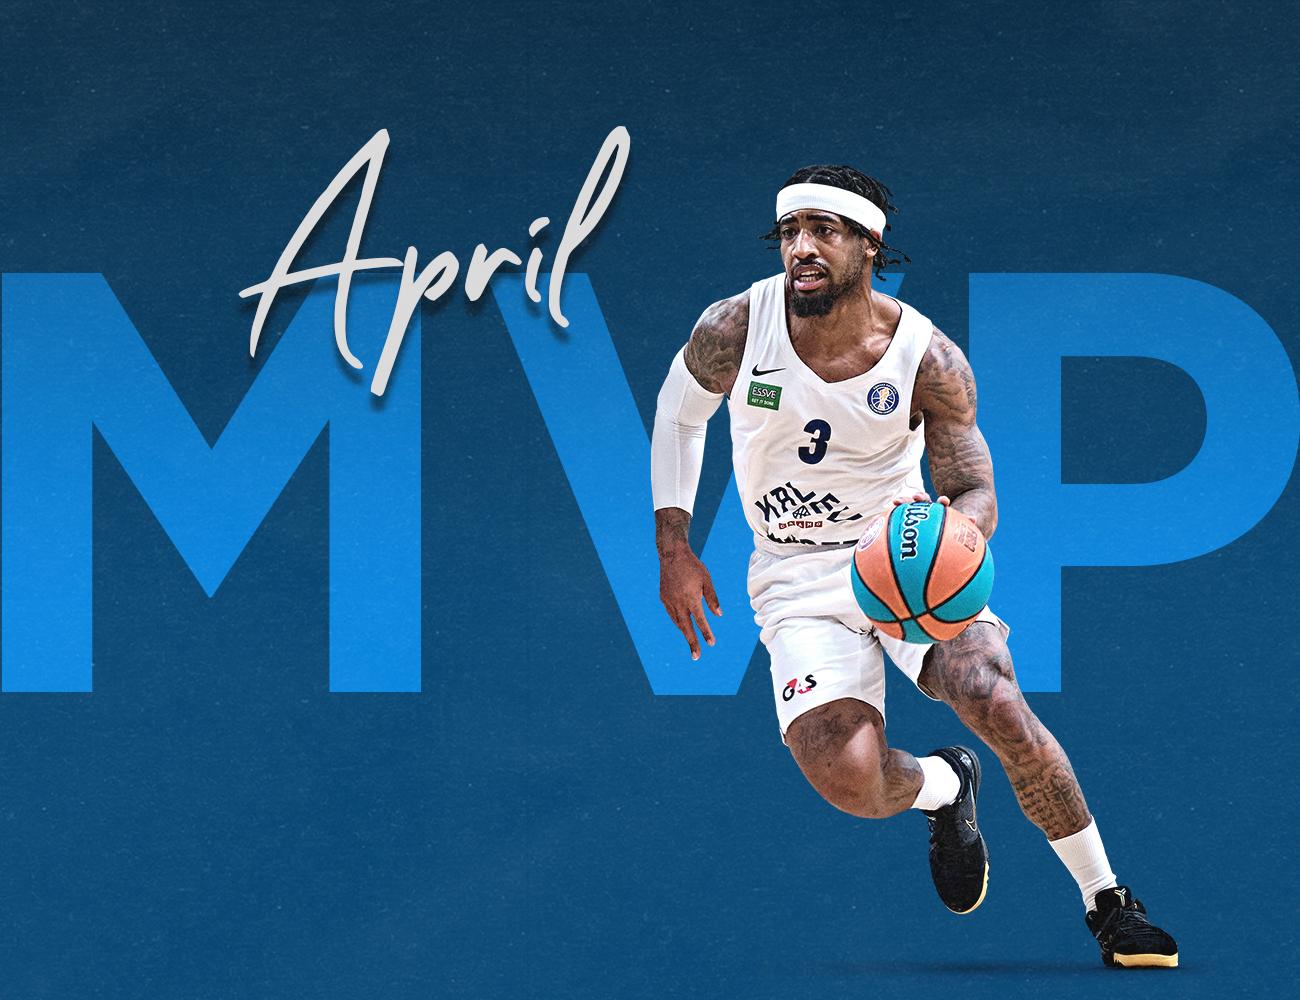 Marcus Keene named April MVP